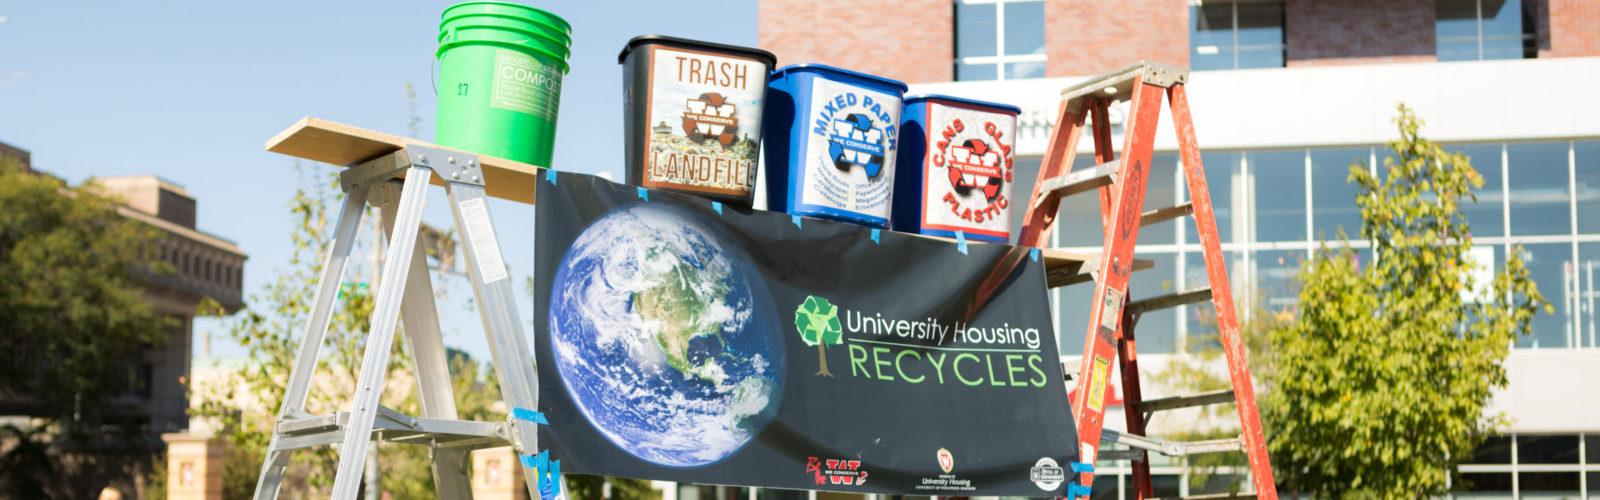 Recycling program struggles isthmus | madison, wisconsin.